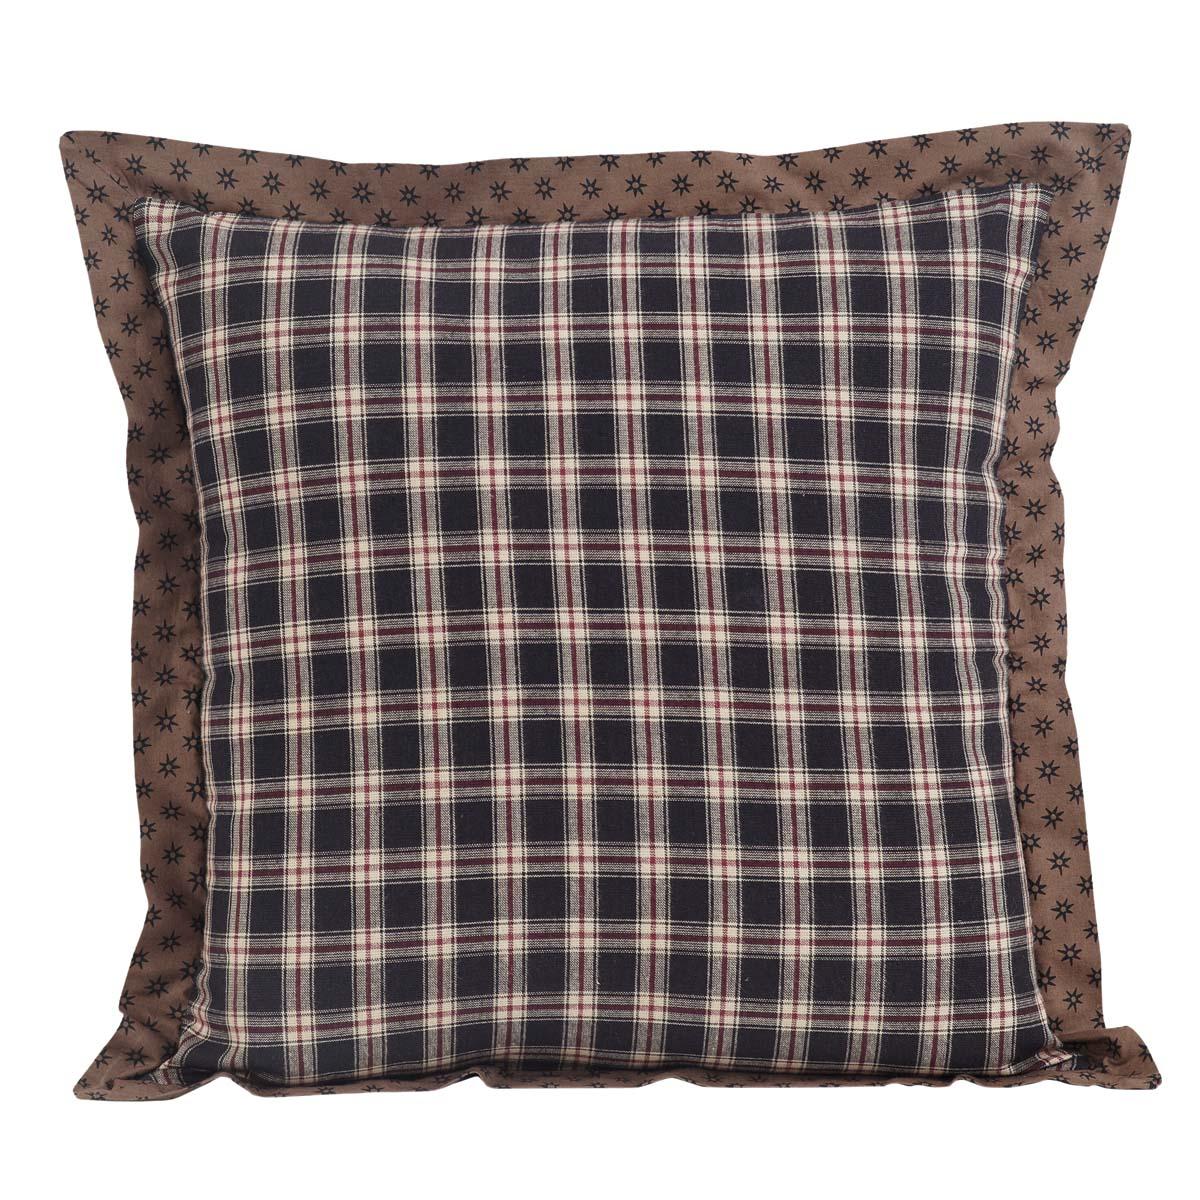 Bingham Star Pillow Fabric 16x16